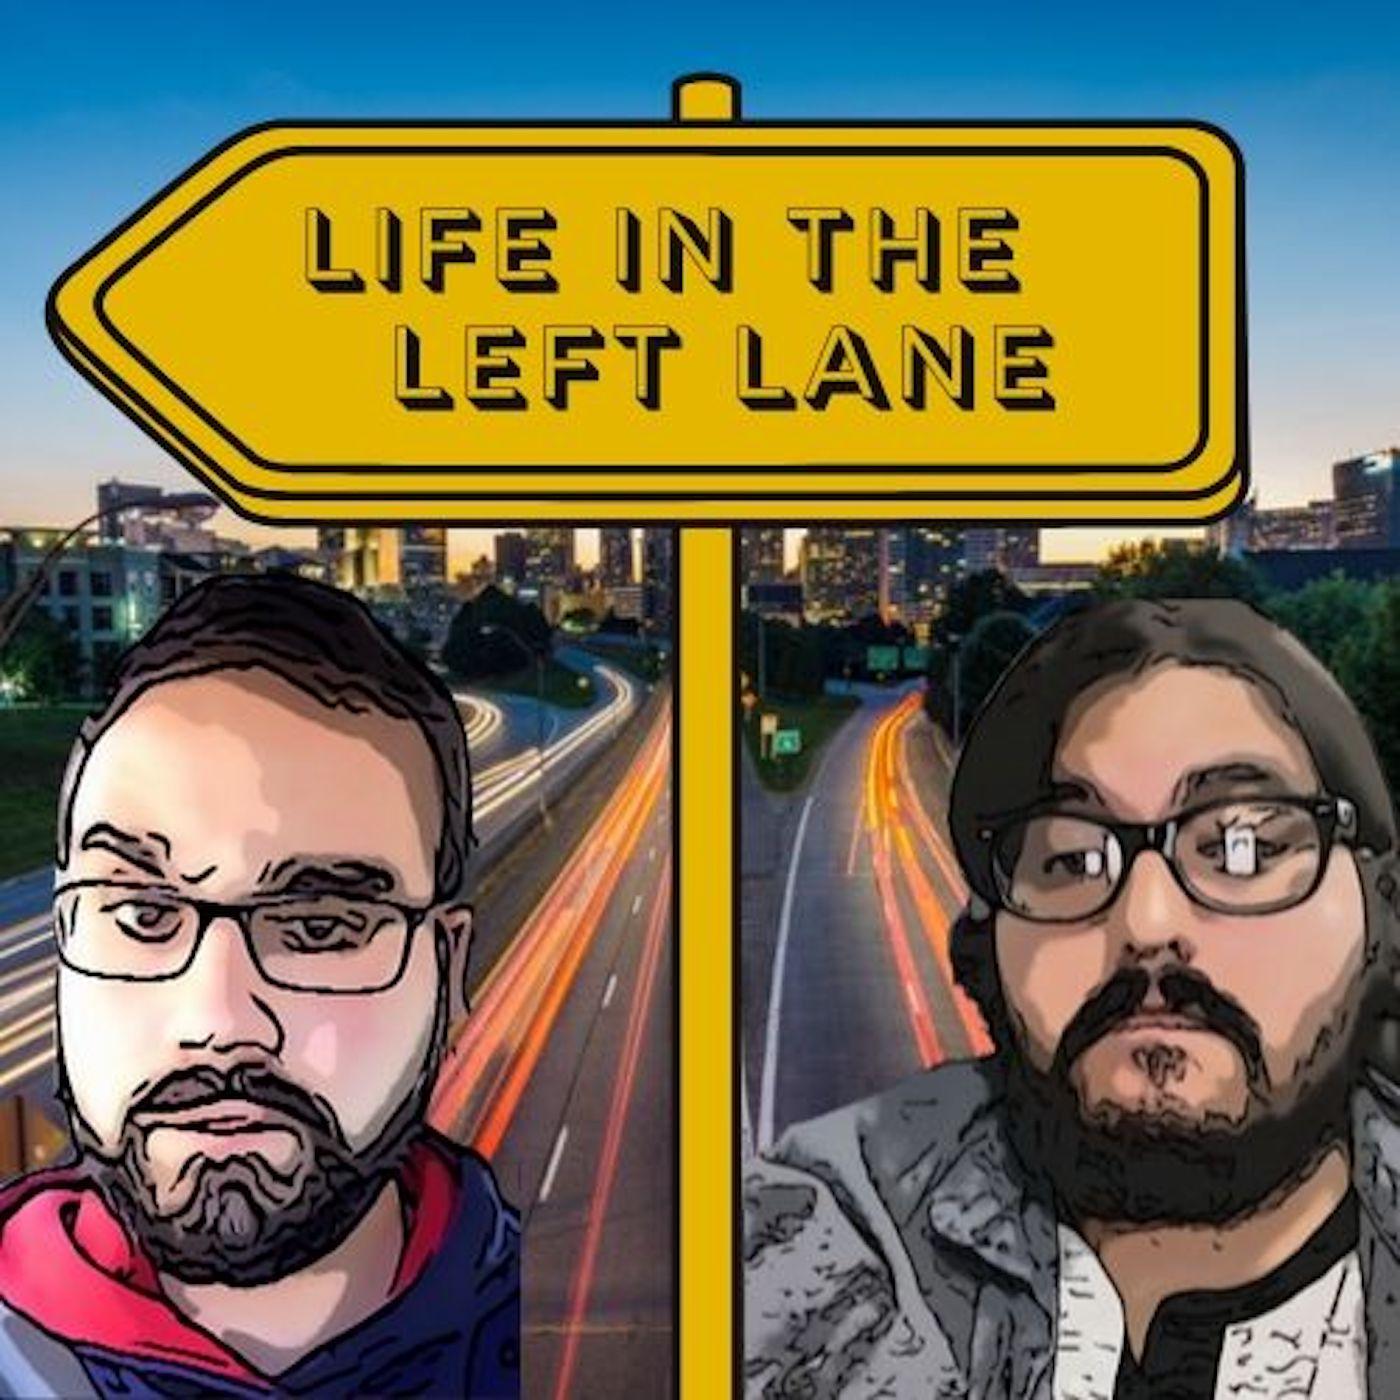 Artwork for podcast Life in the Left Lane Podcast